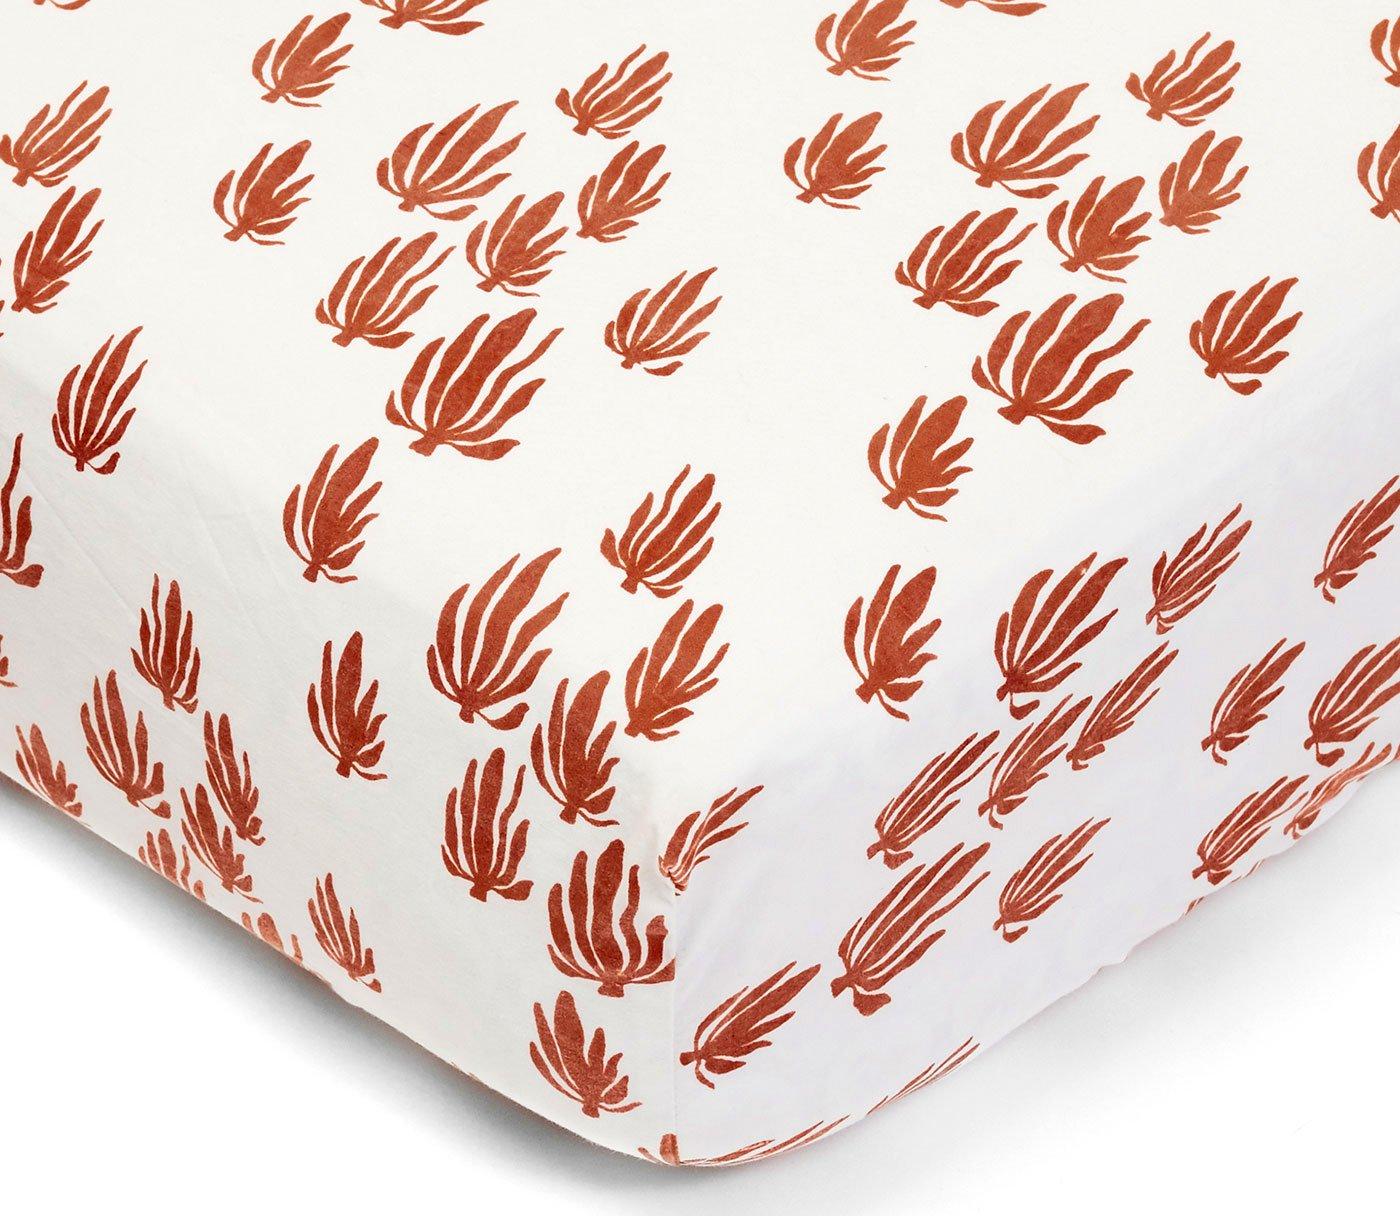 Lewis Organic Cotton Fitted Crib Sheet Seaweed Print 100% Organic Cotton Percale, Rust